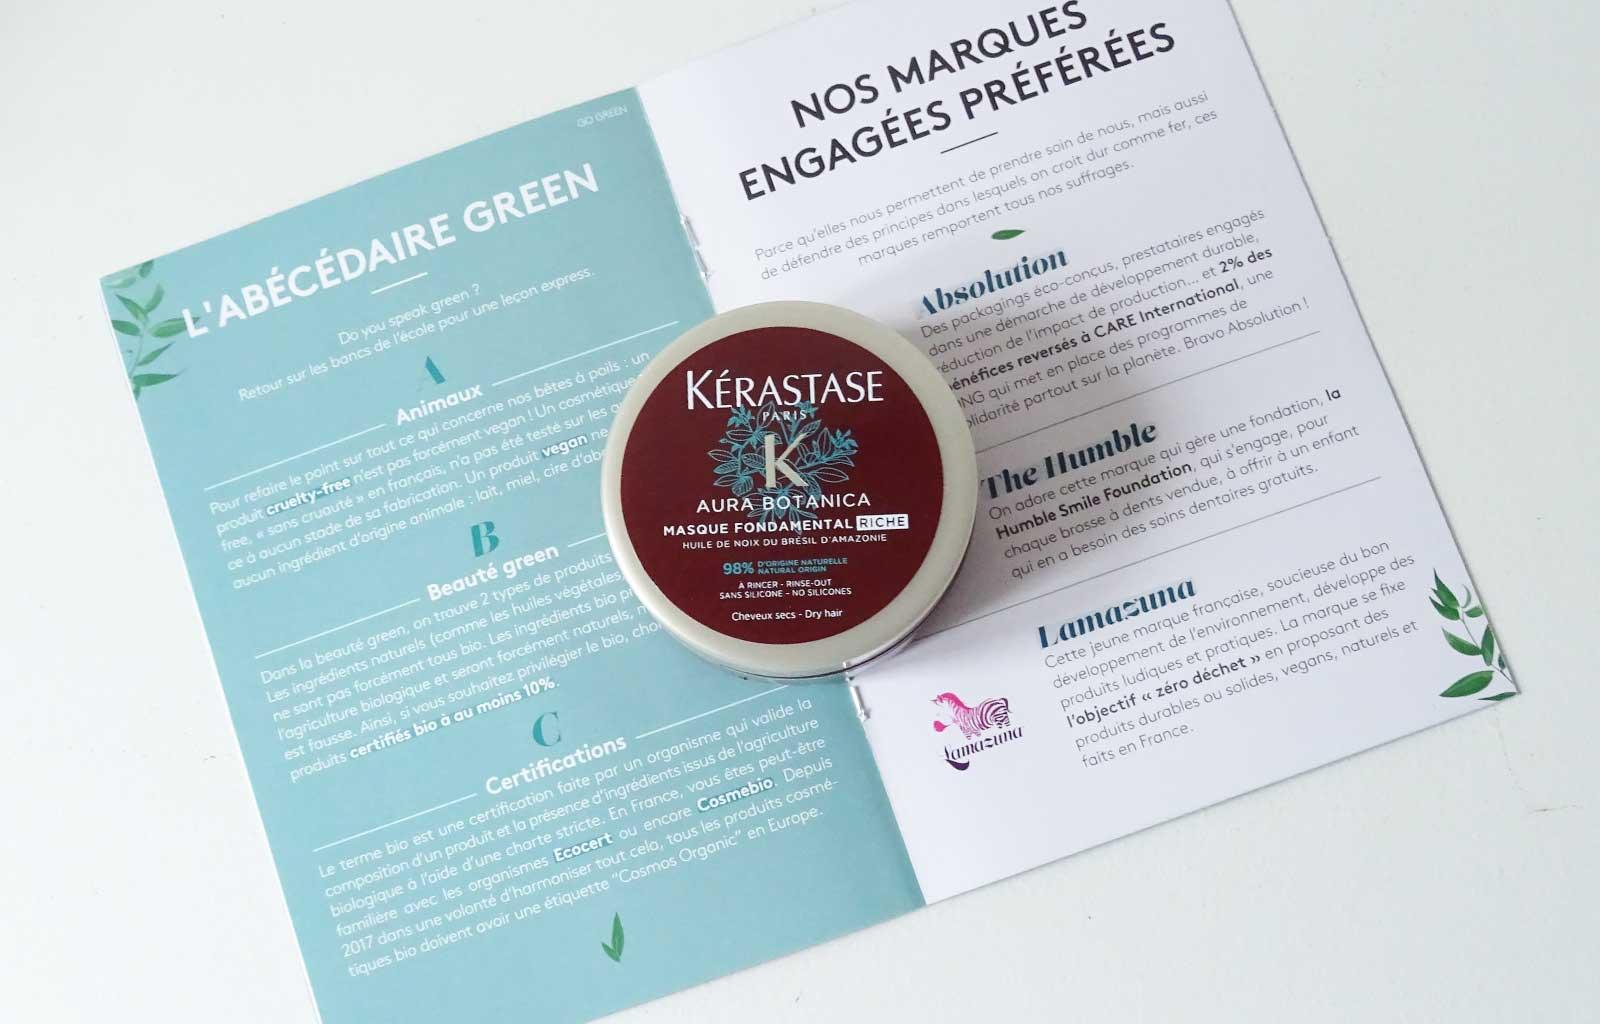 Kérastase, Masque Fondamental Riche Aura Botanica